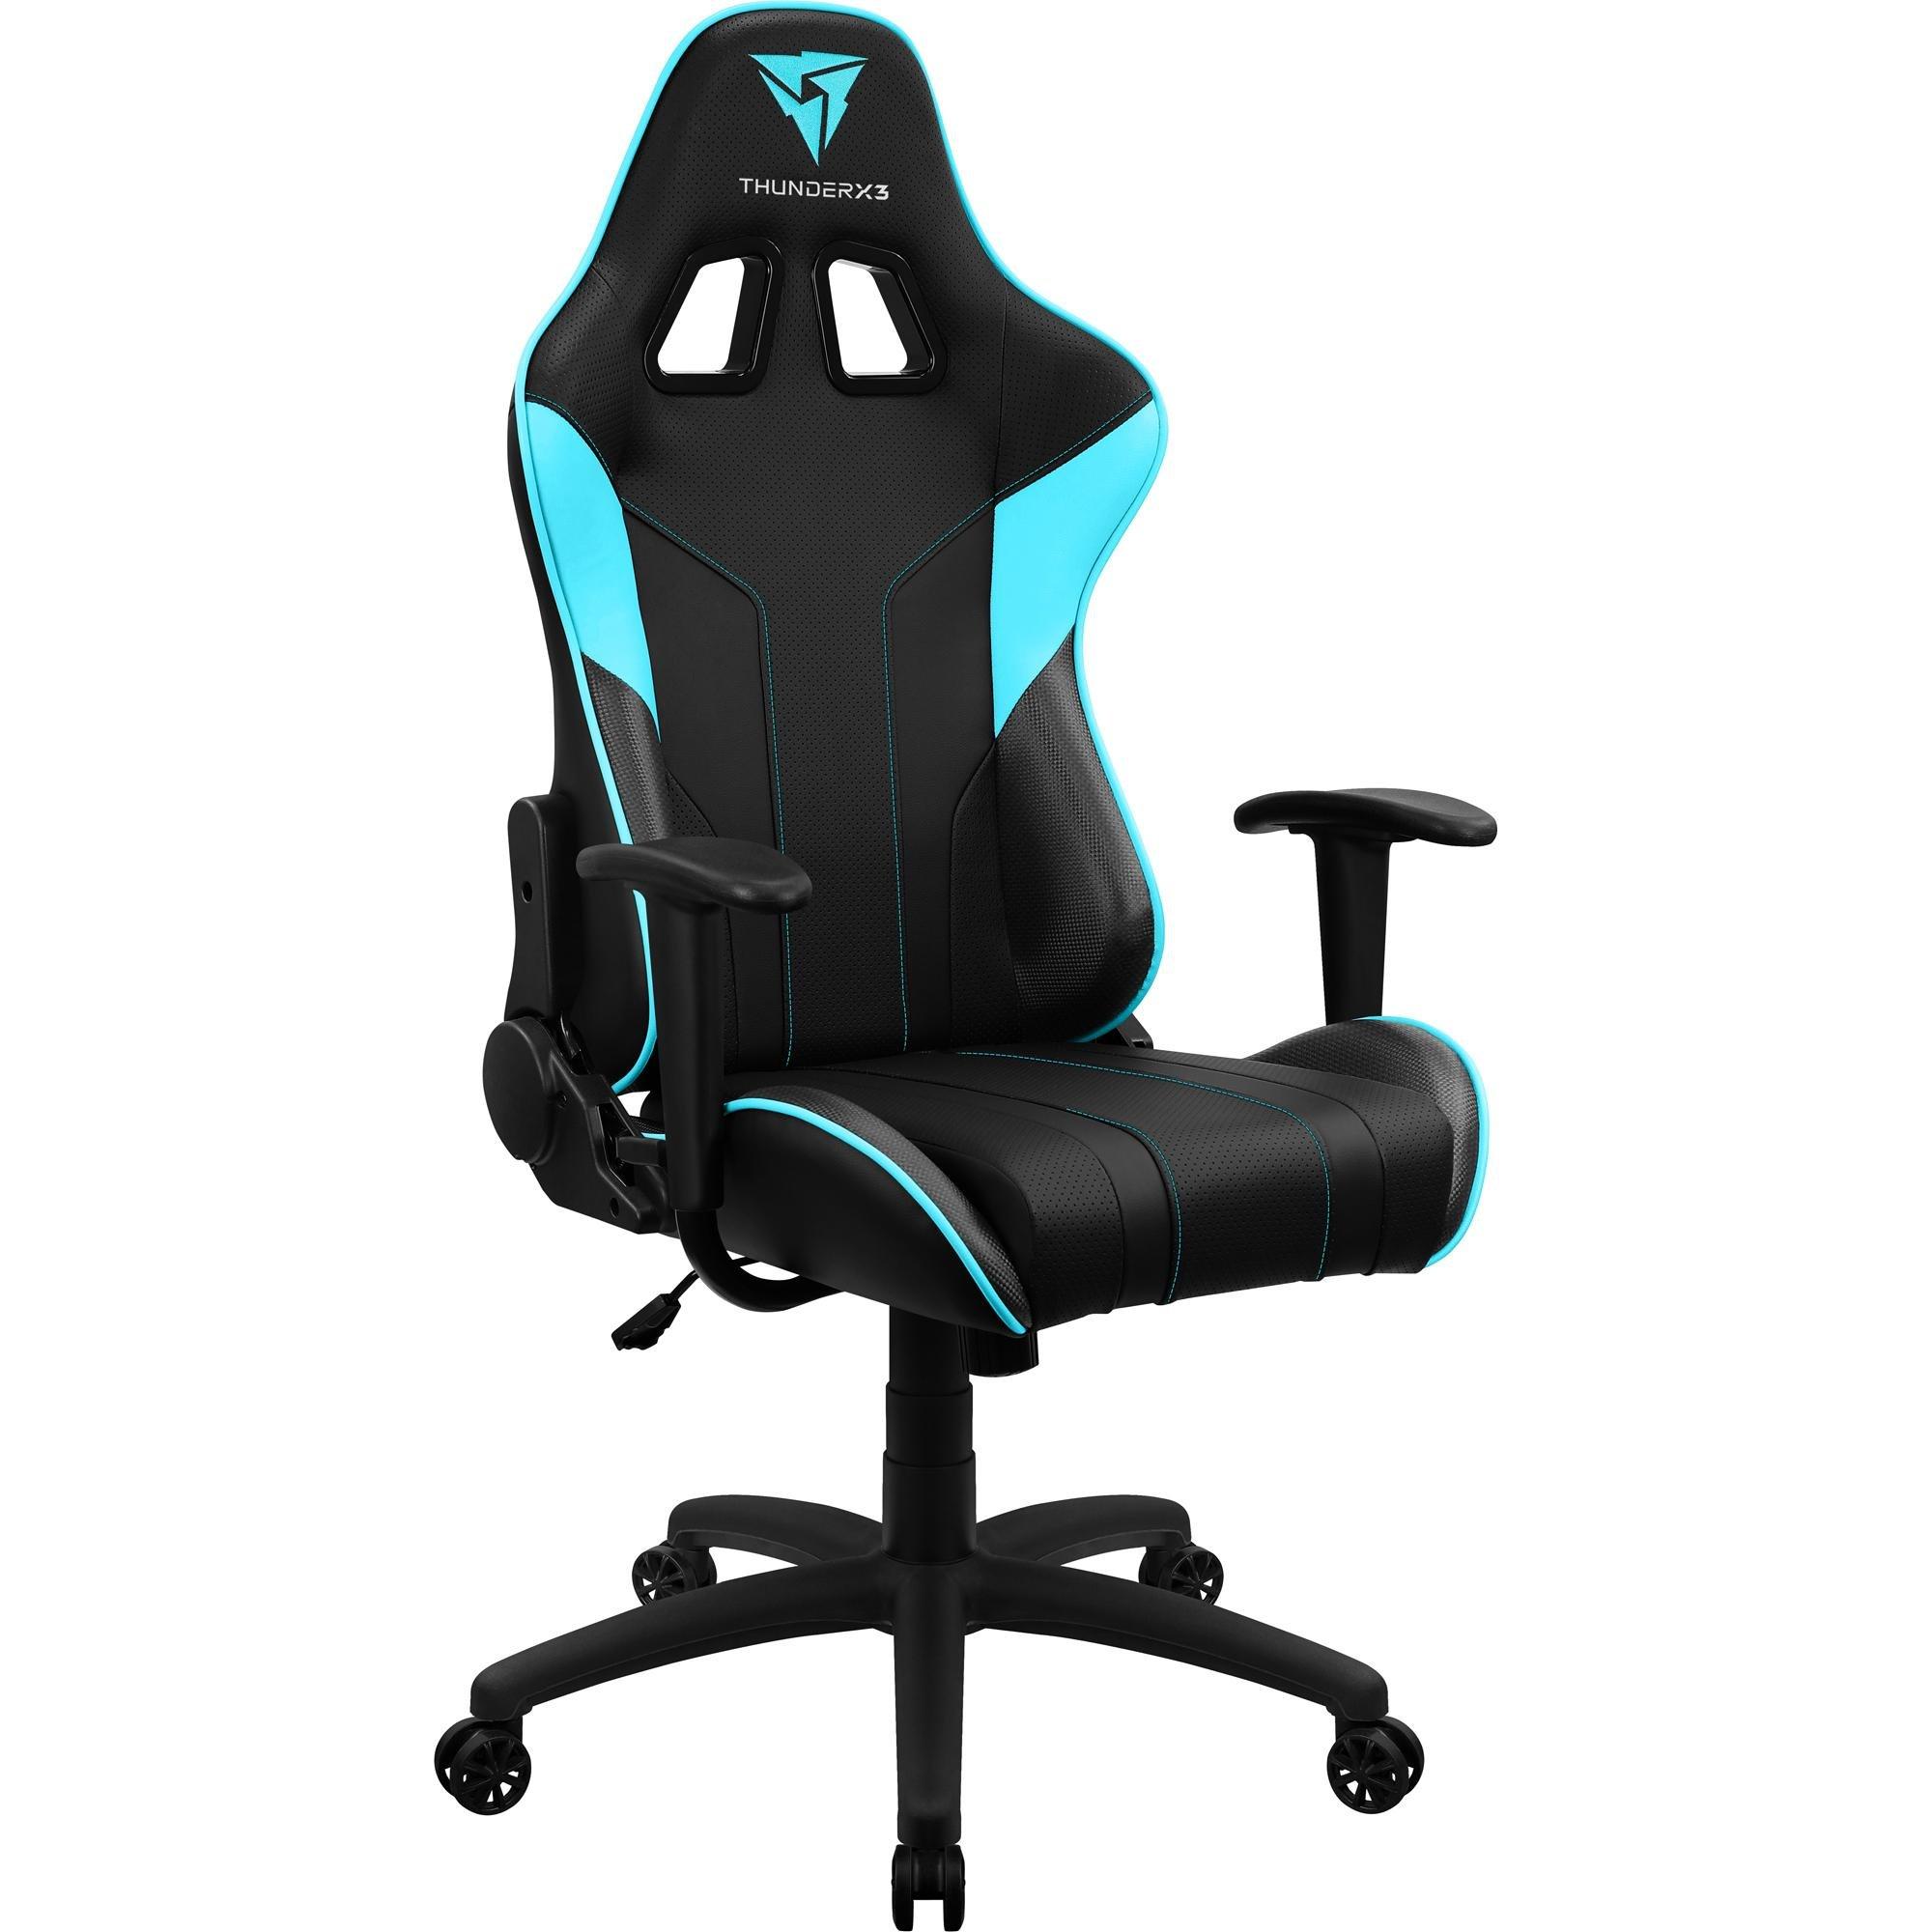 Cadeira Gamer EC3 Cyan THUNDERX3